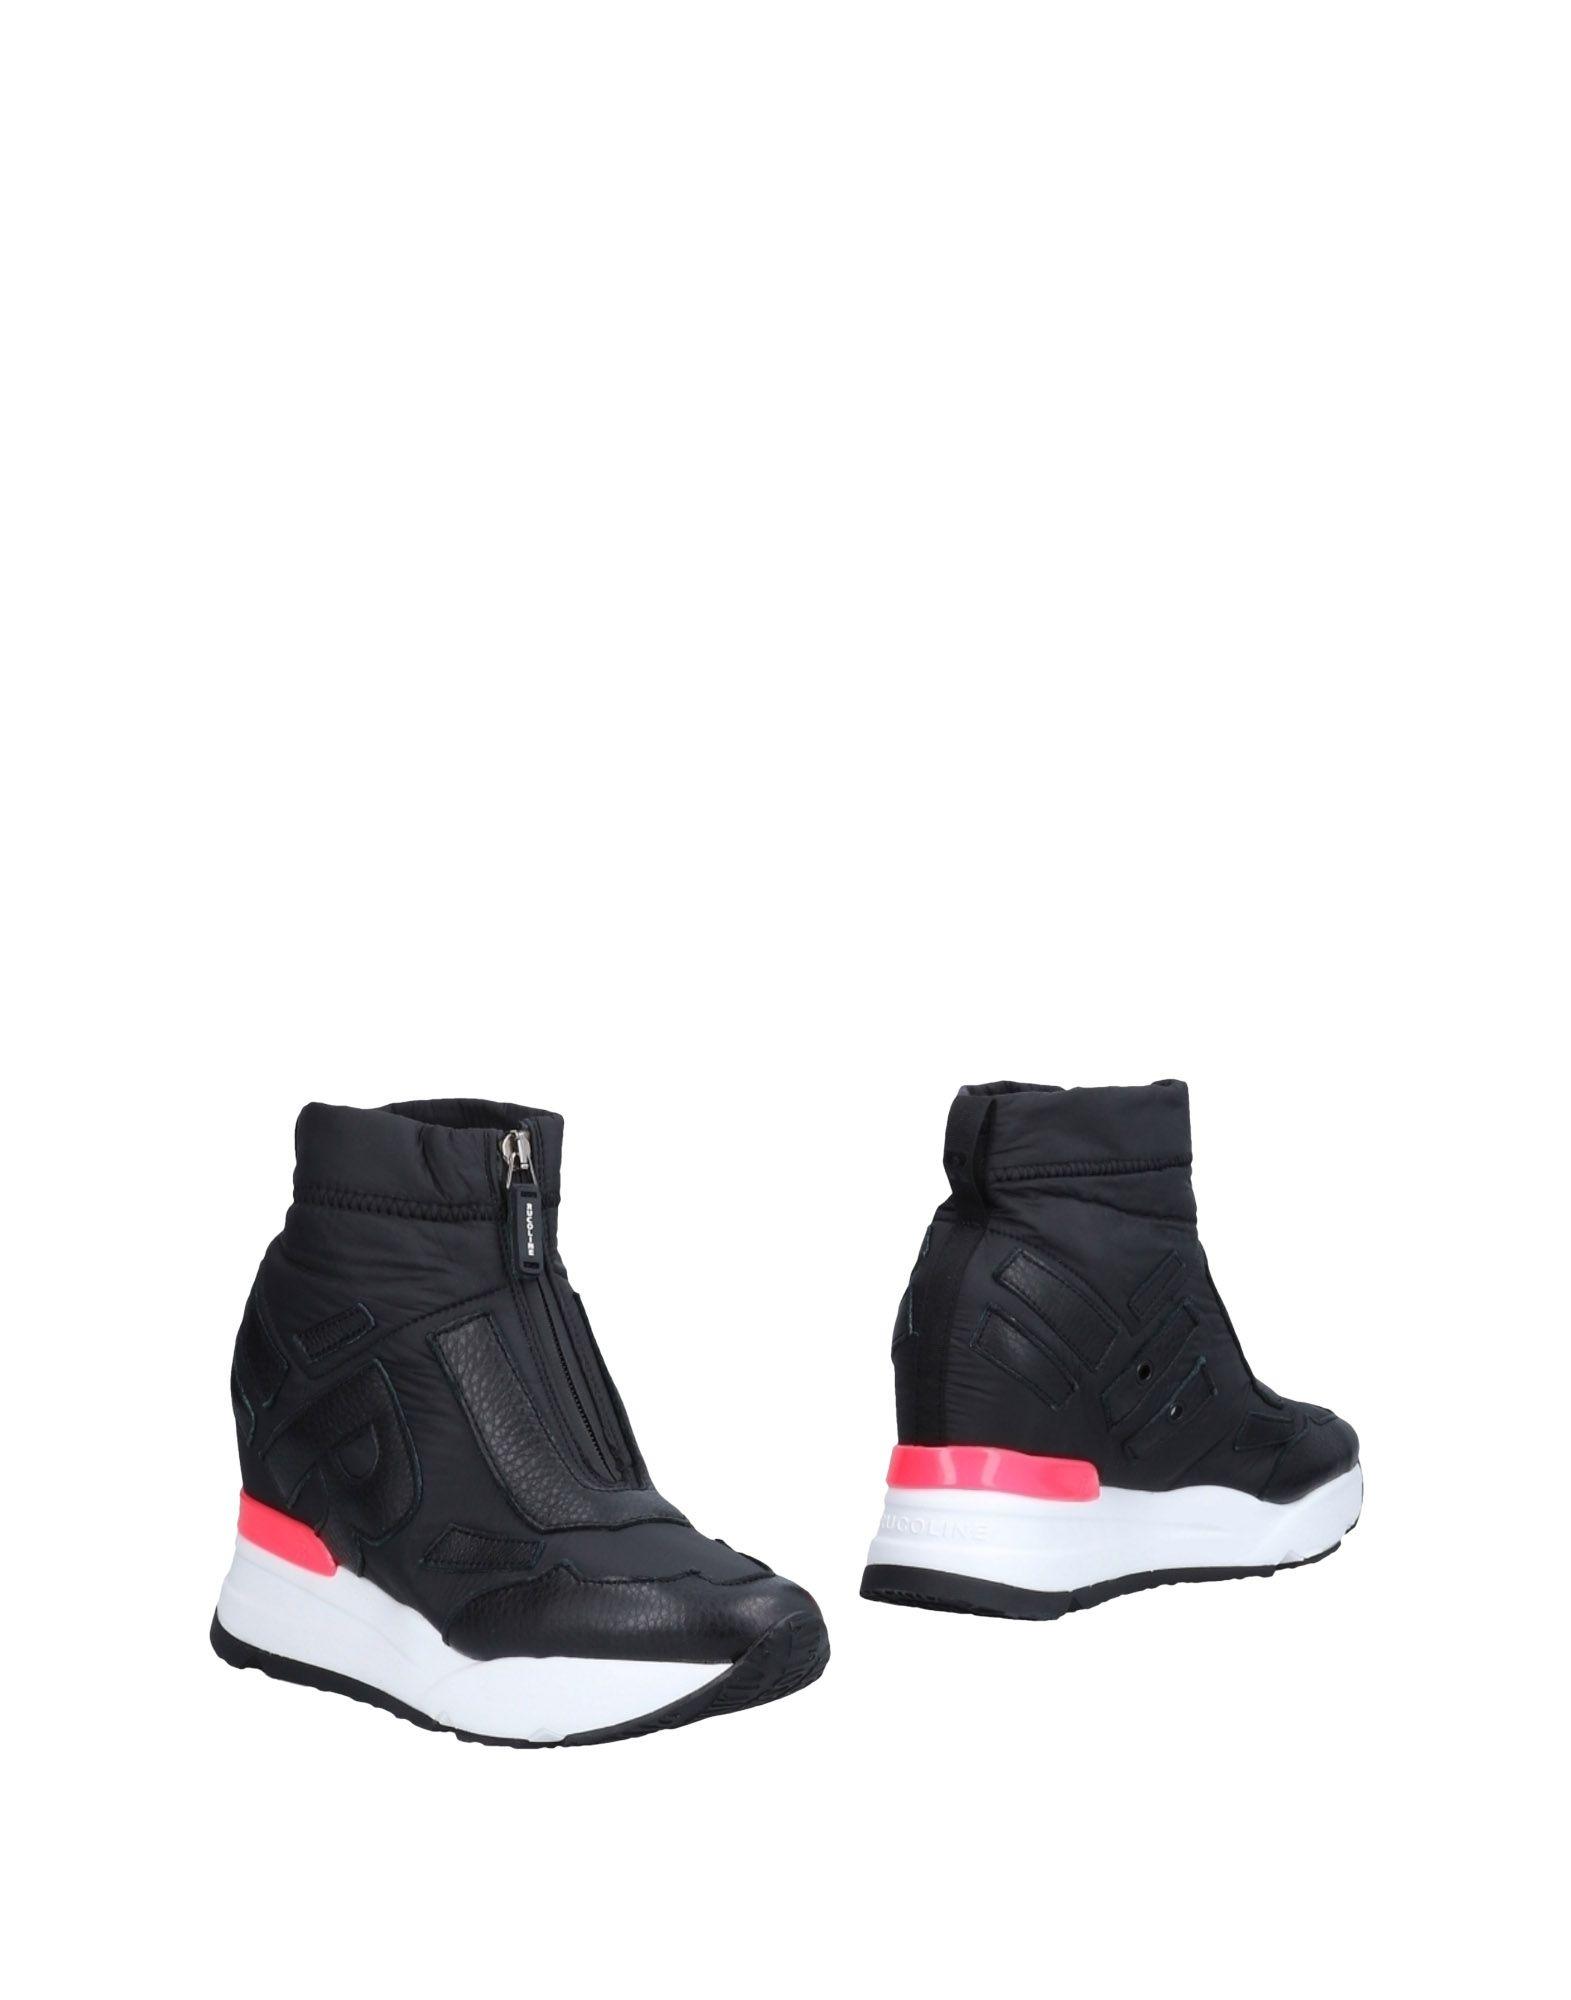 Stilvolle billige Schuhe Ruco 11478218LN Line Stiefelette Damen  11478218LN Ruco 166387